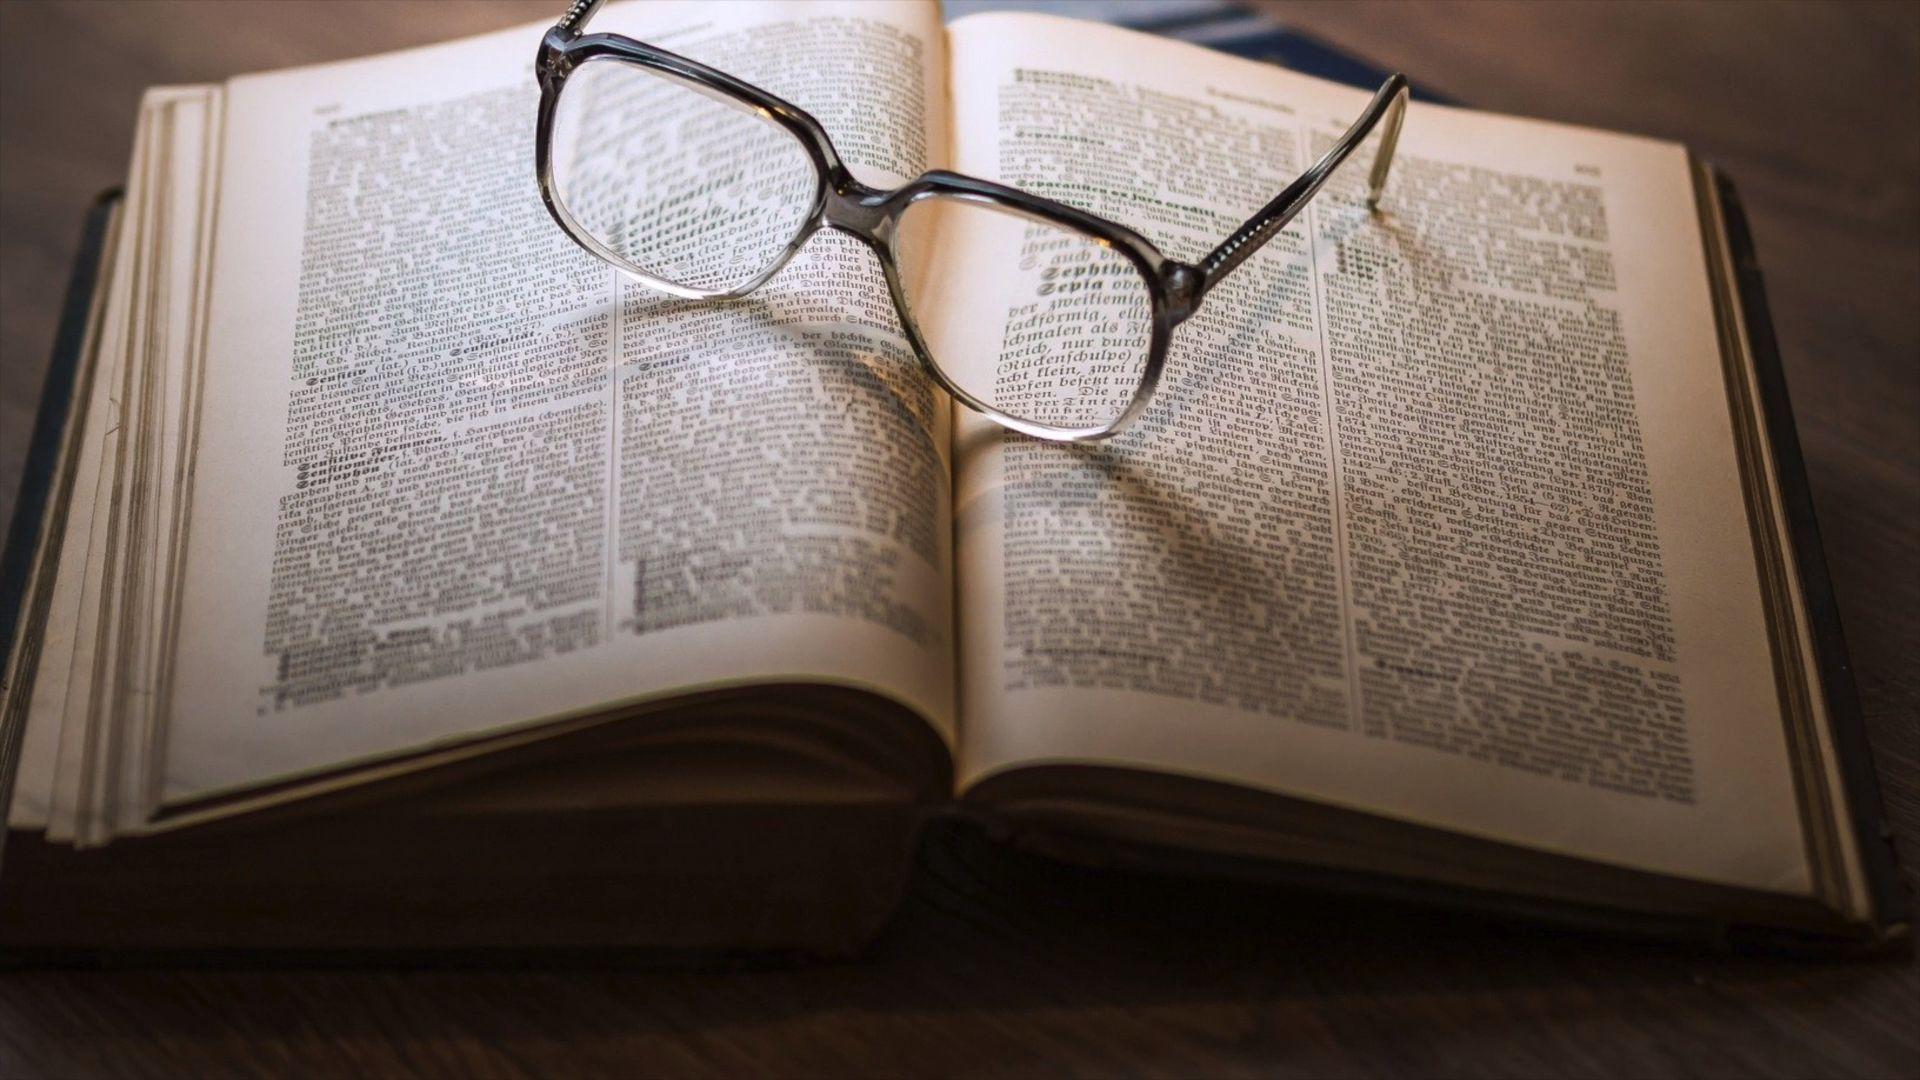 Harry Potter bis Hobbit: Die meistverkauften Romane aller Zeiten